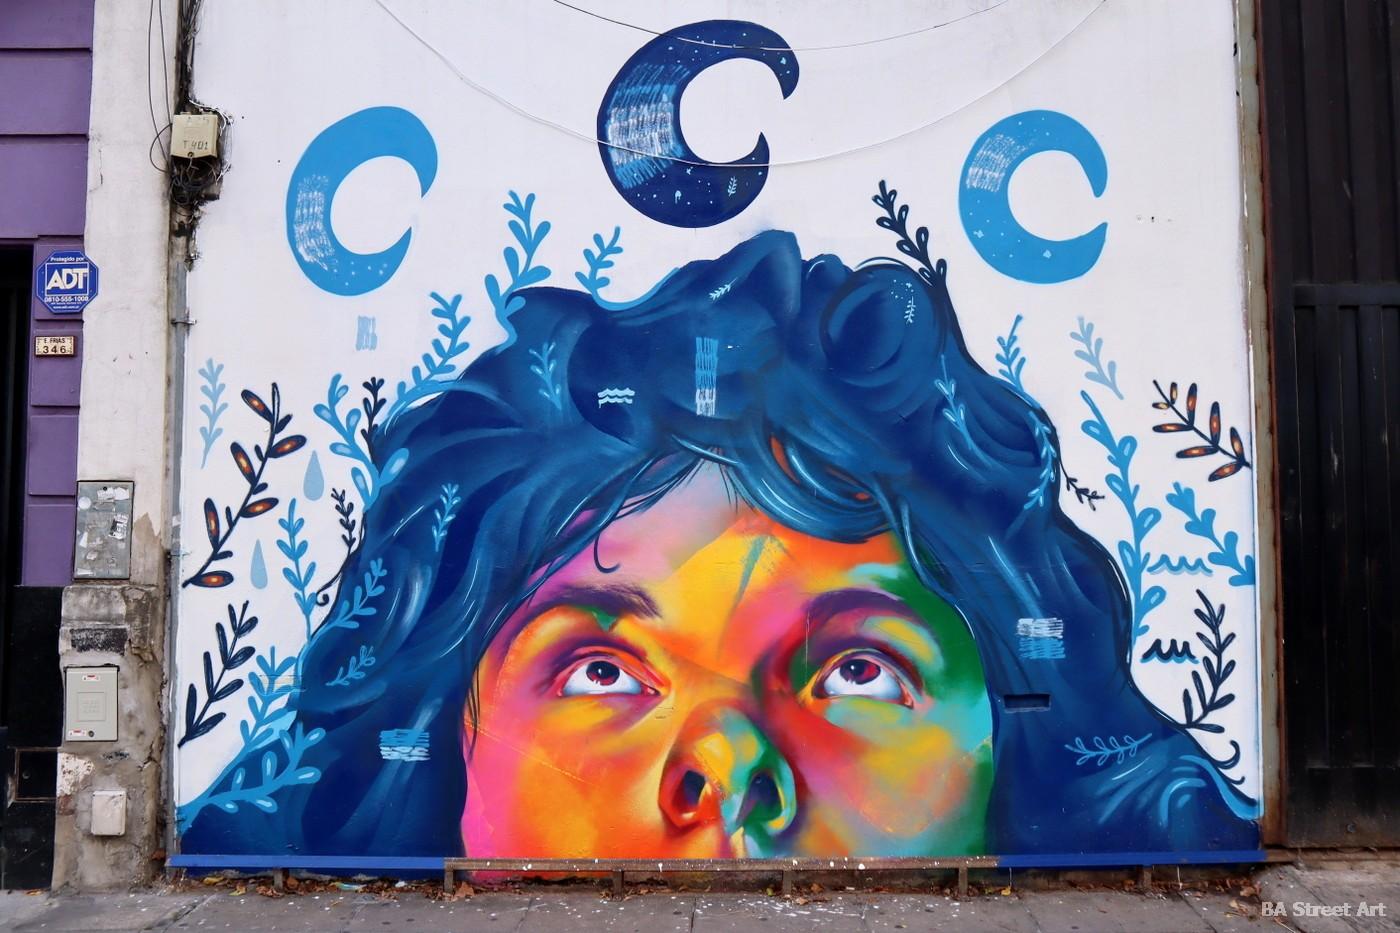 murales retrato artista argentina cara pinceles artista plastico urbano portrait buenos aires villa crespo pared muro